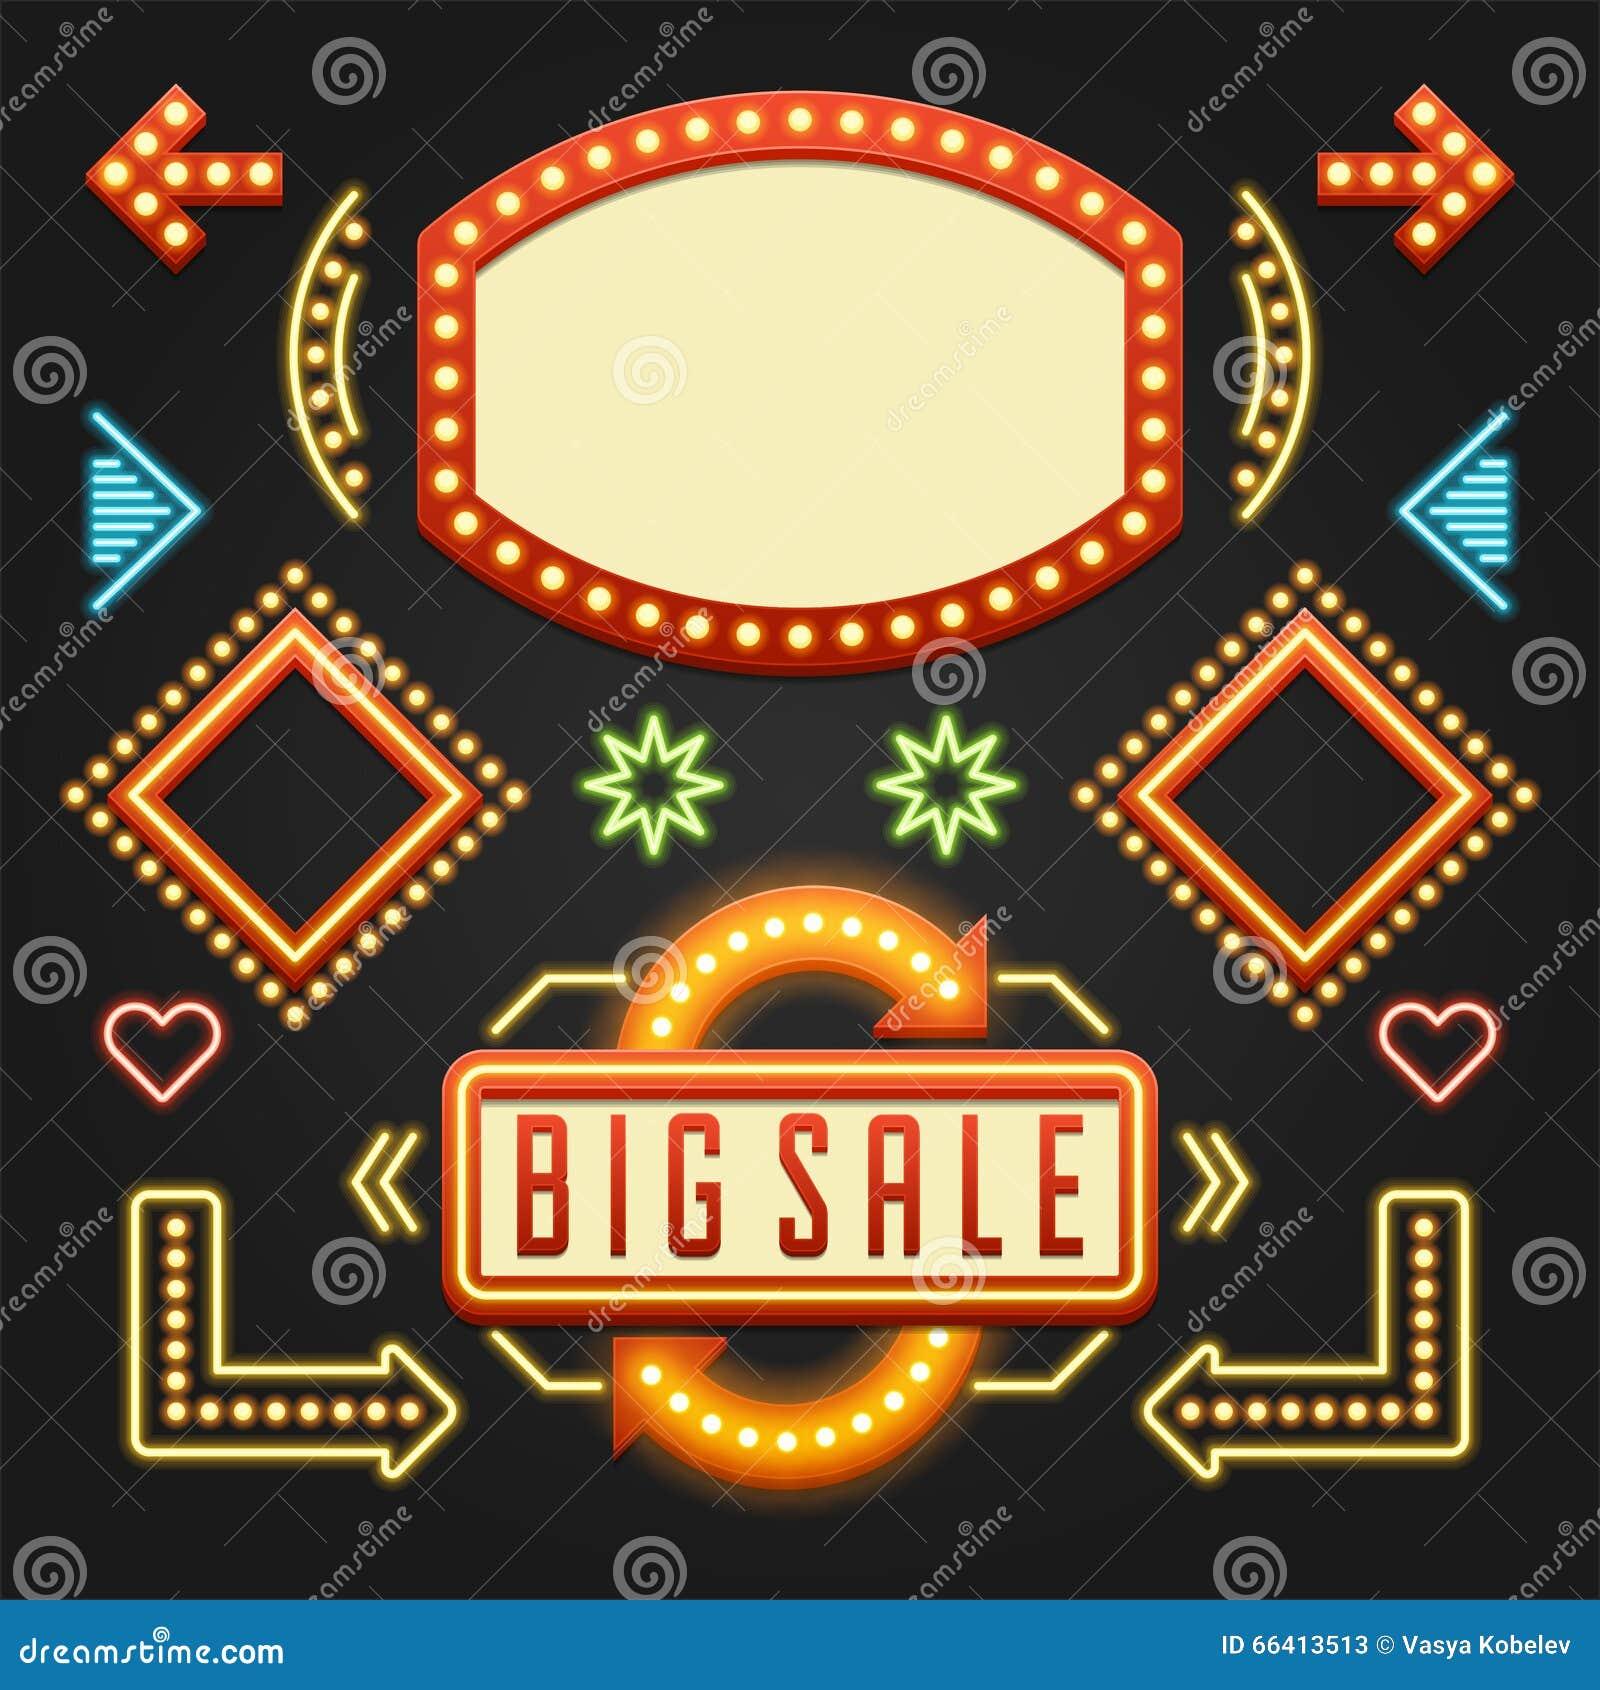 Retro showtime signs design elements set stock vector image 66413513 - Showtime design ...